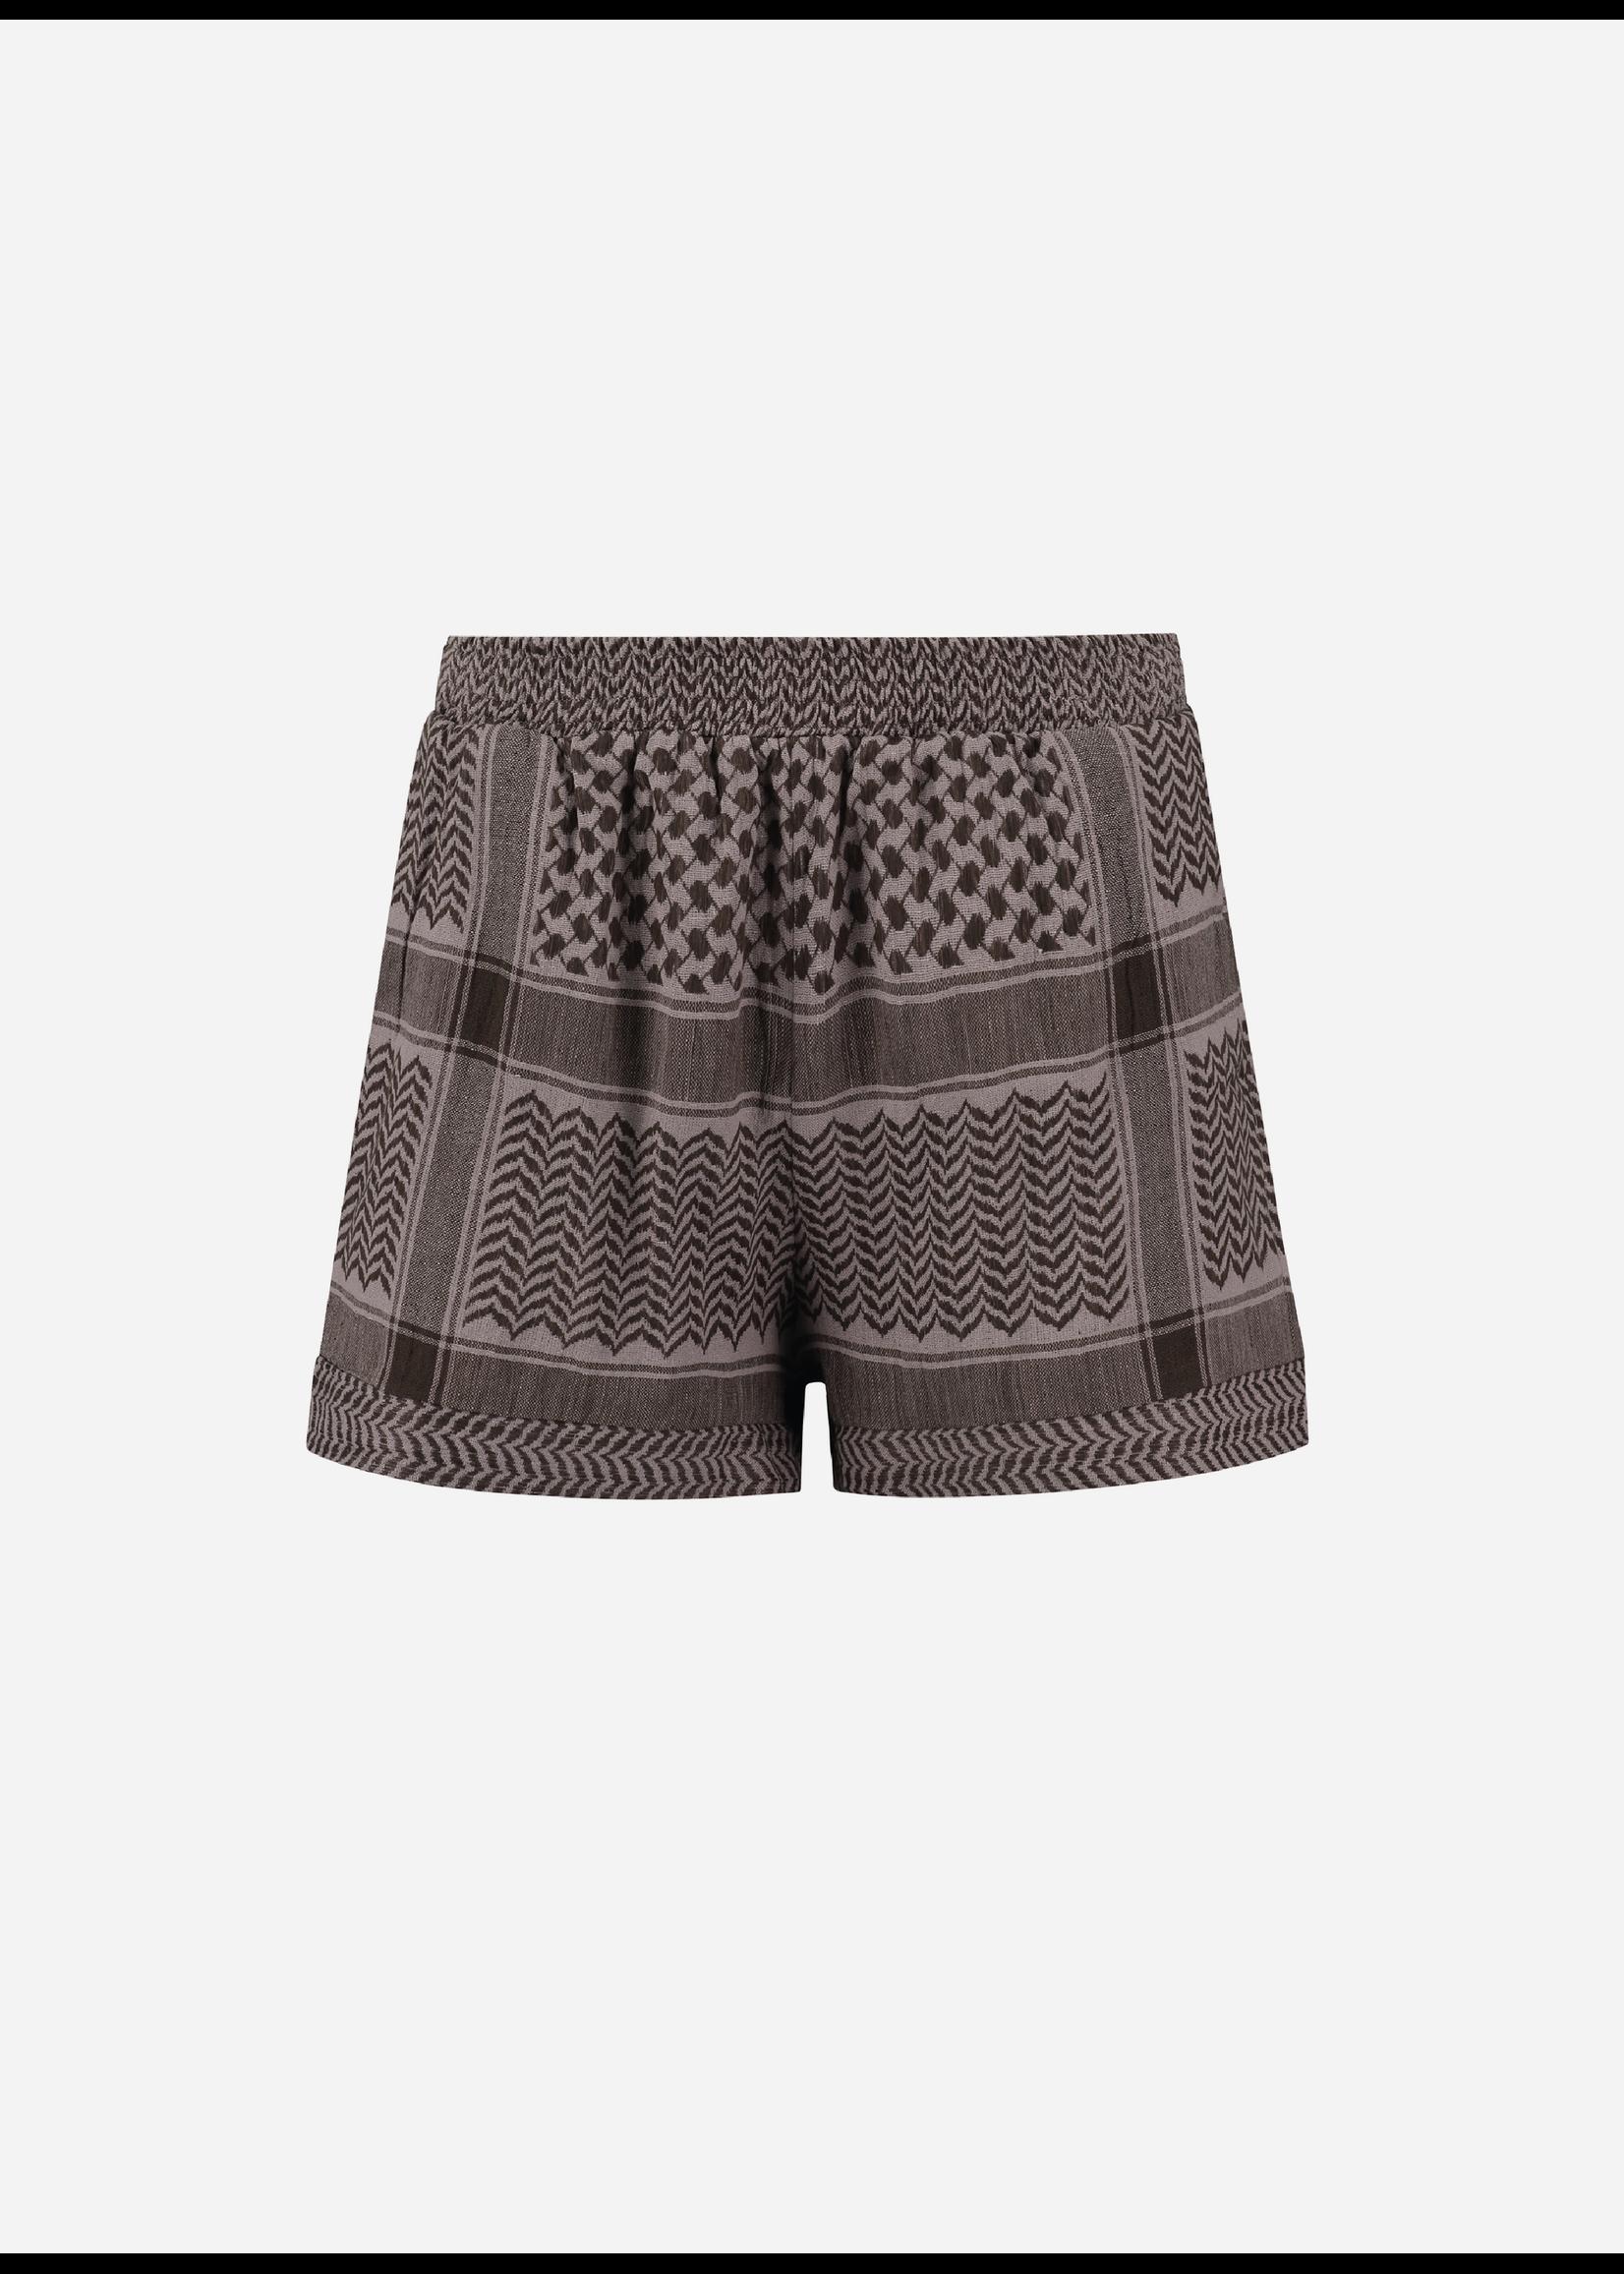 Rough Studios Devito shorts brown/lilac